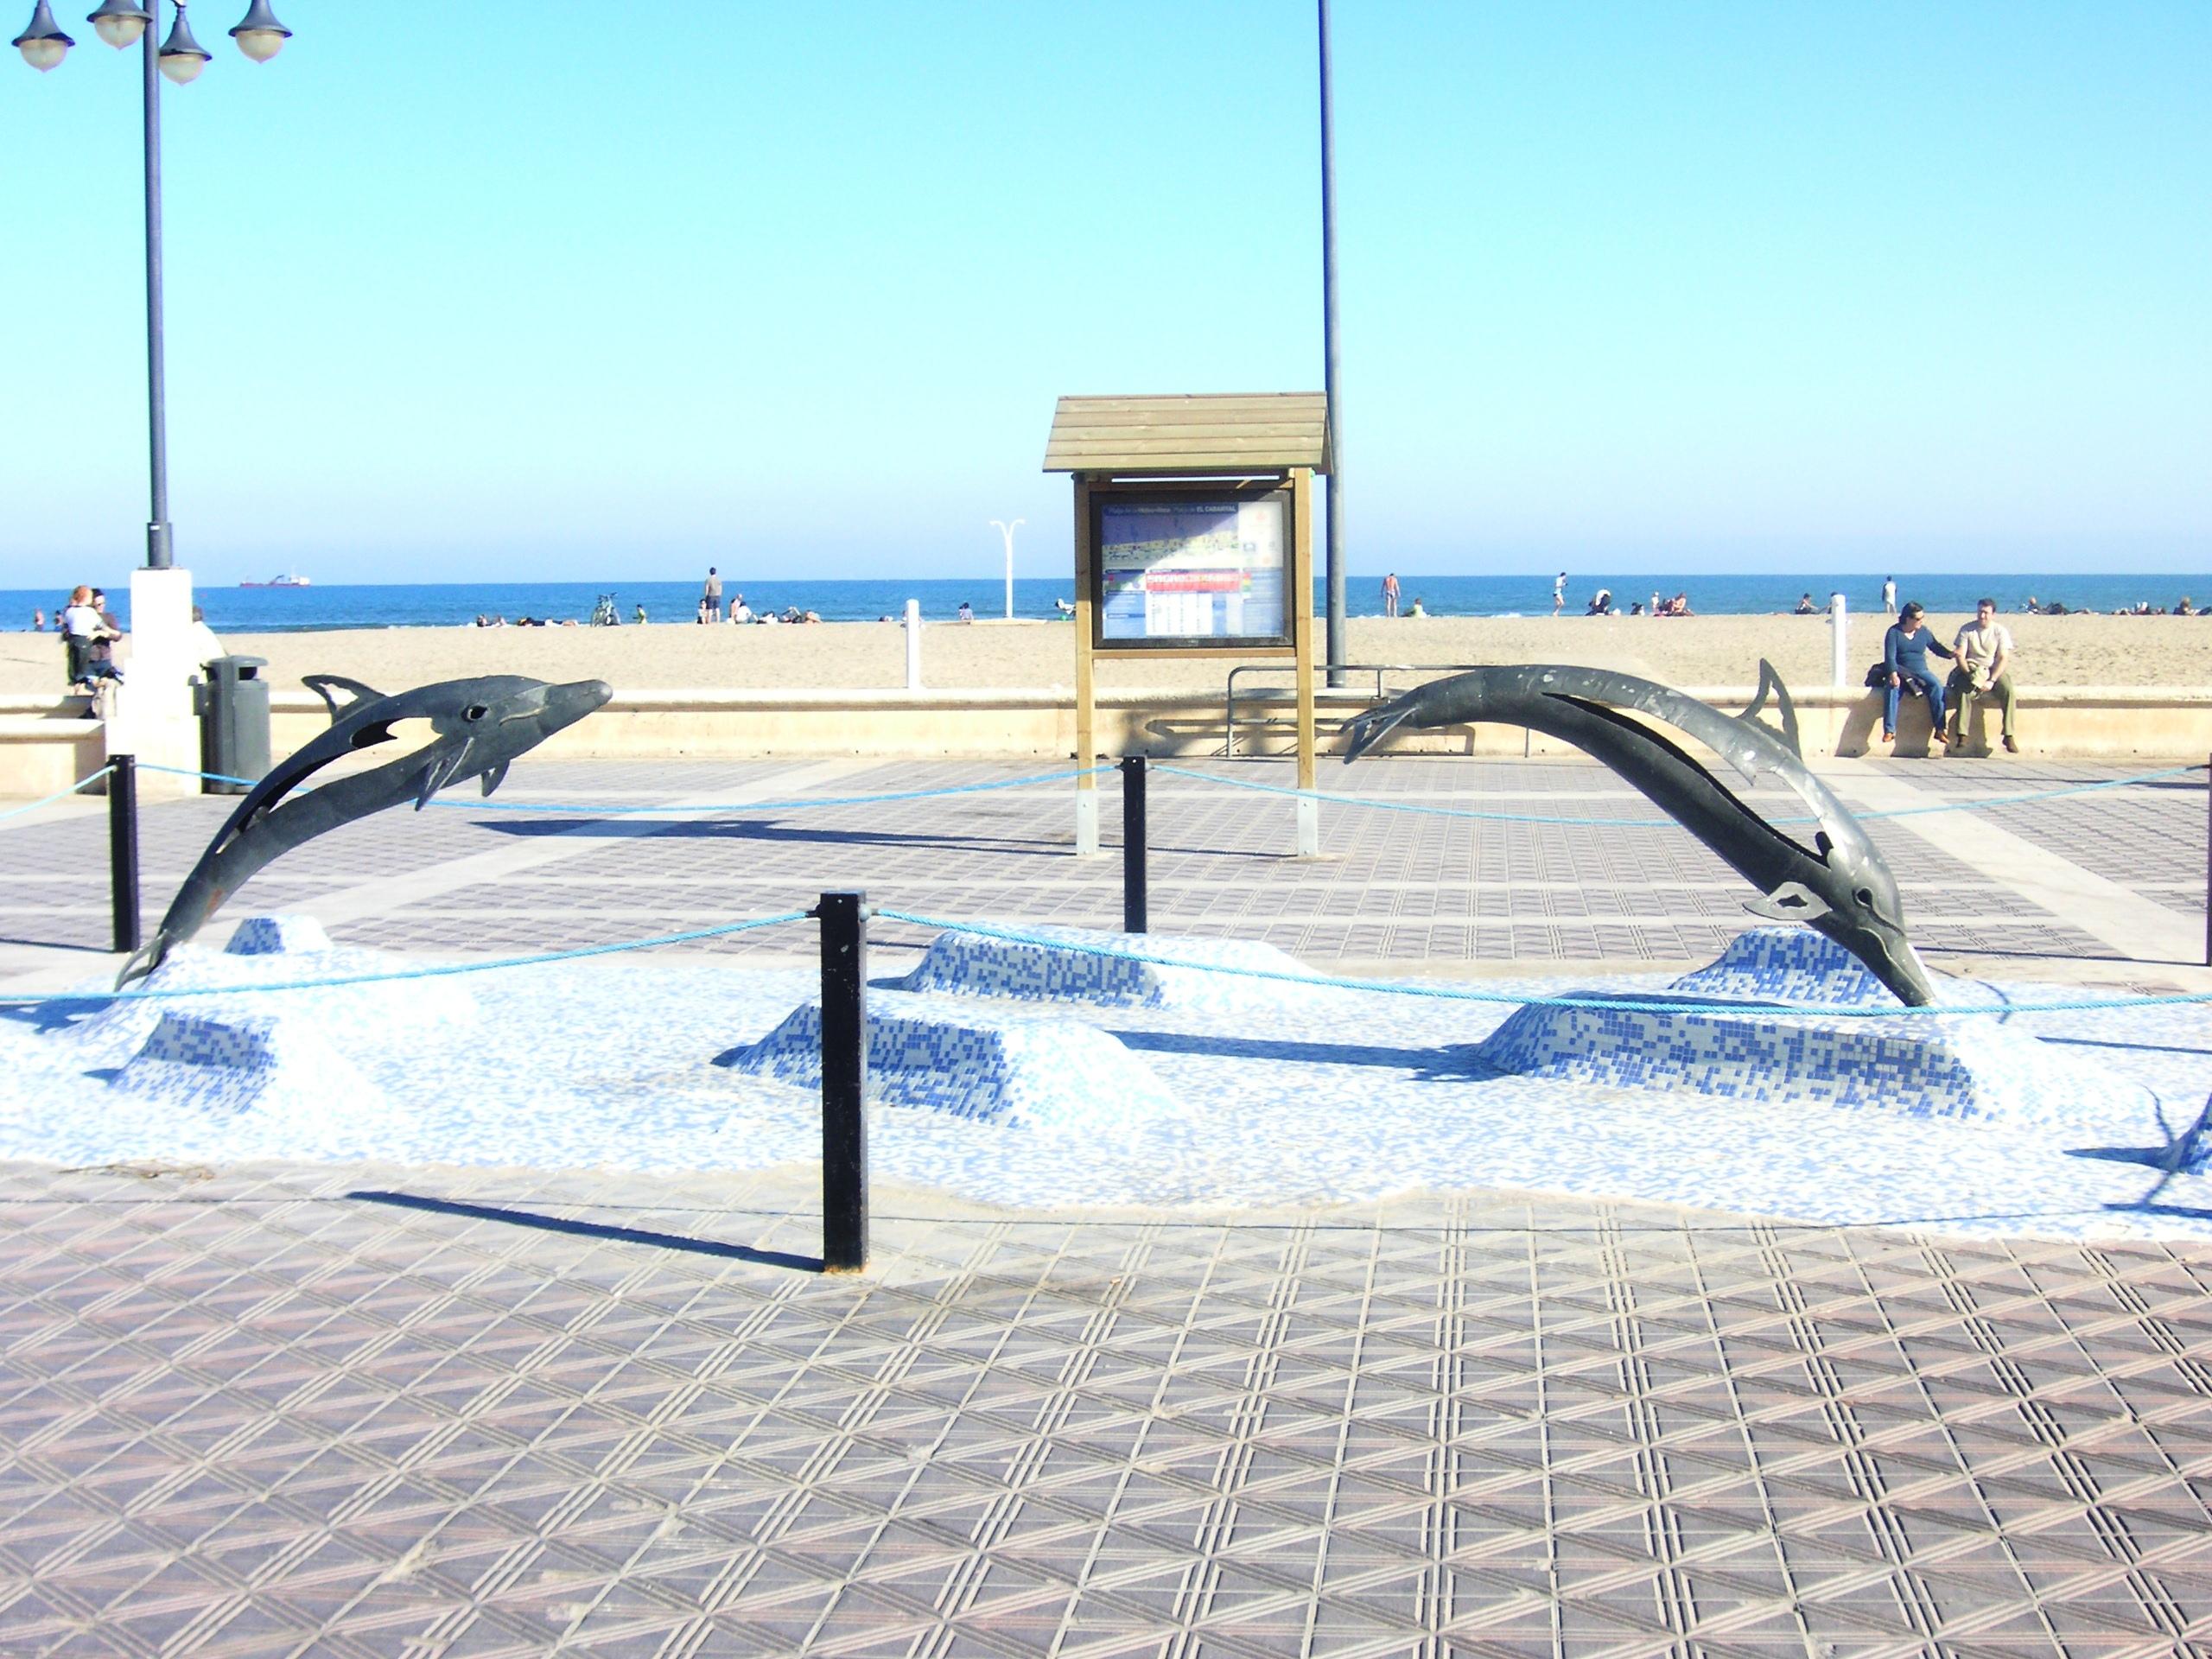 Foto playa Cabanyal  / Las Arenas. Valencia, Delphinskulpturen am Strand